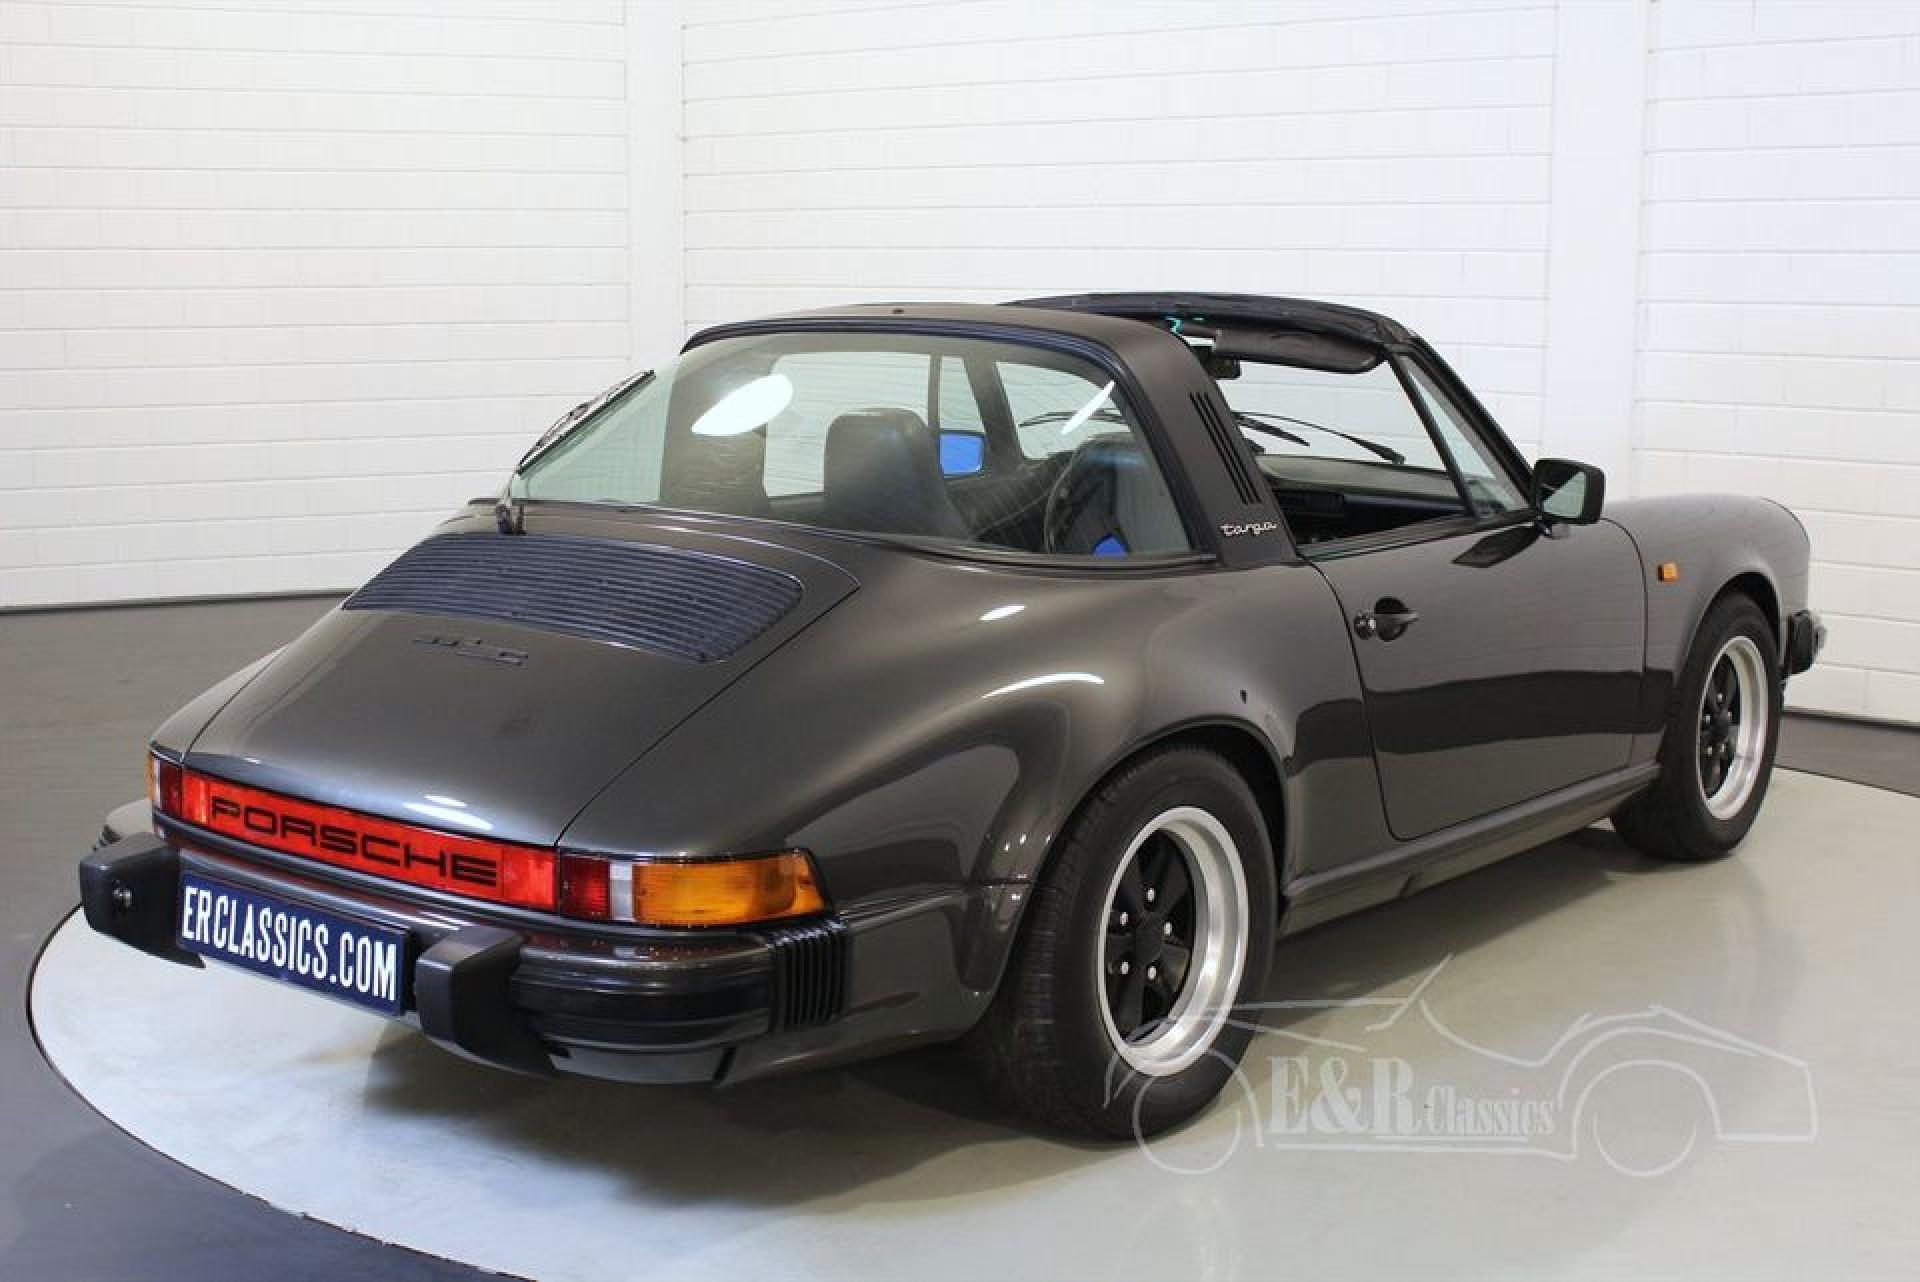 Porsche 911sc Targa 1980 For Sale At Erclassics